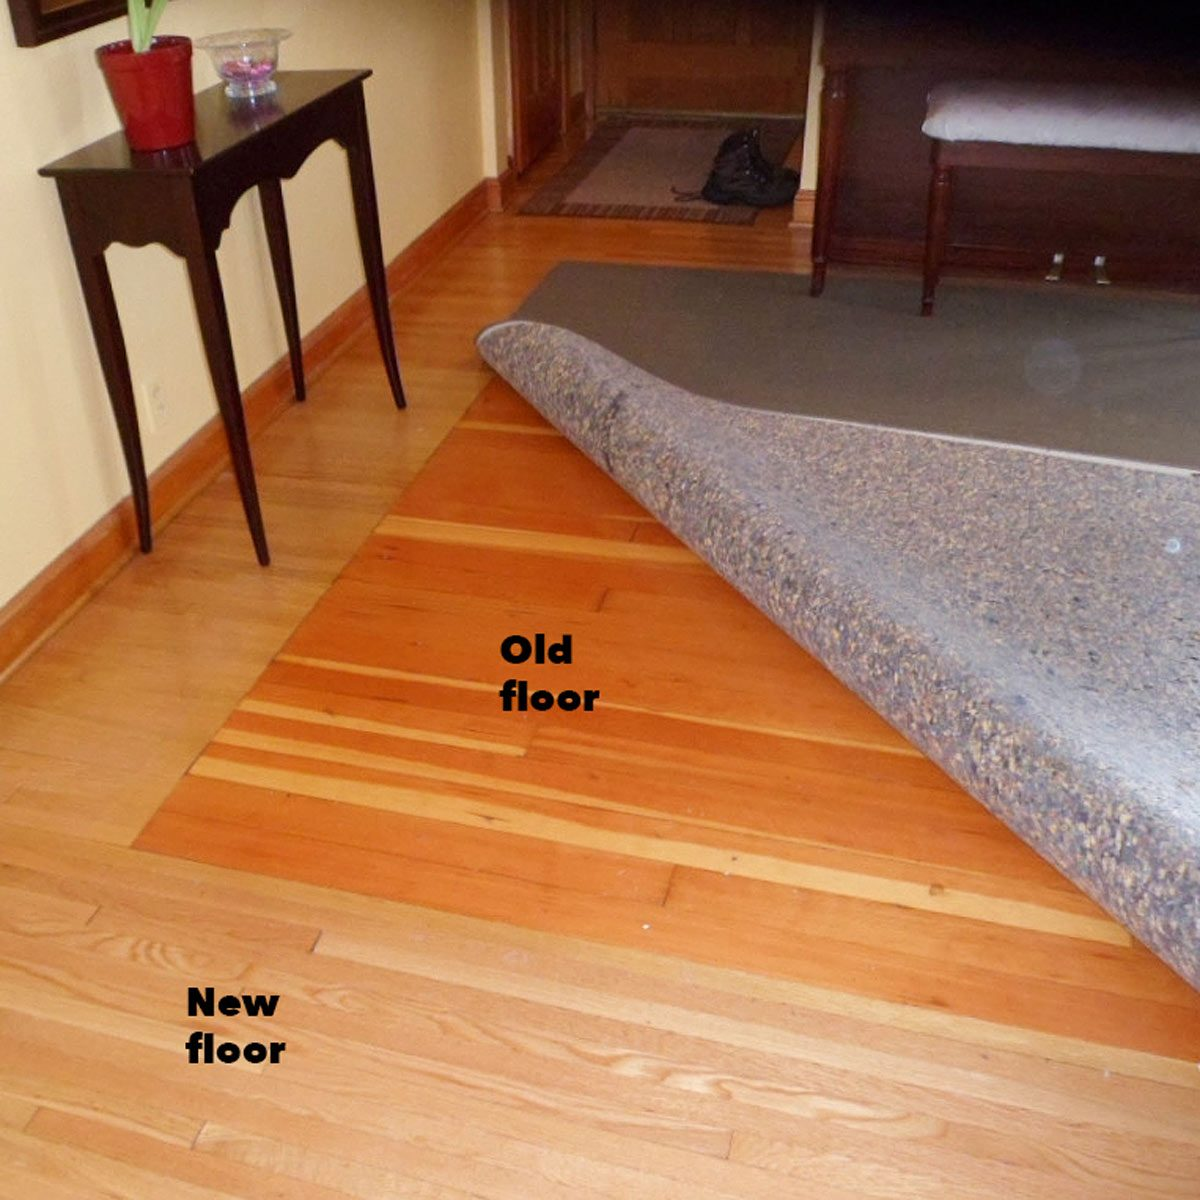 hardwood floor rug cover up old wood floor